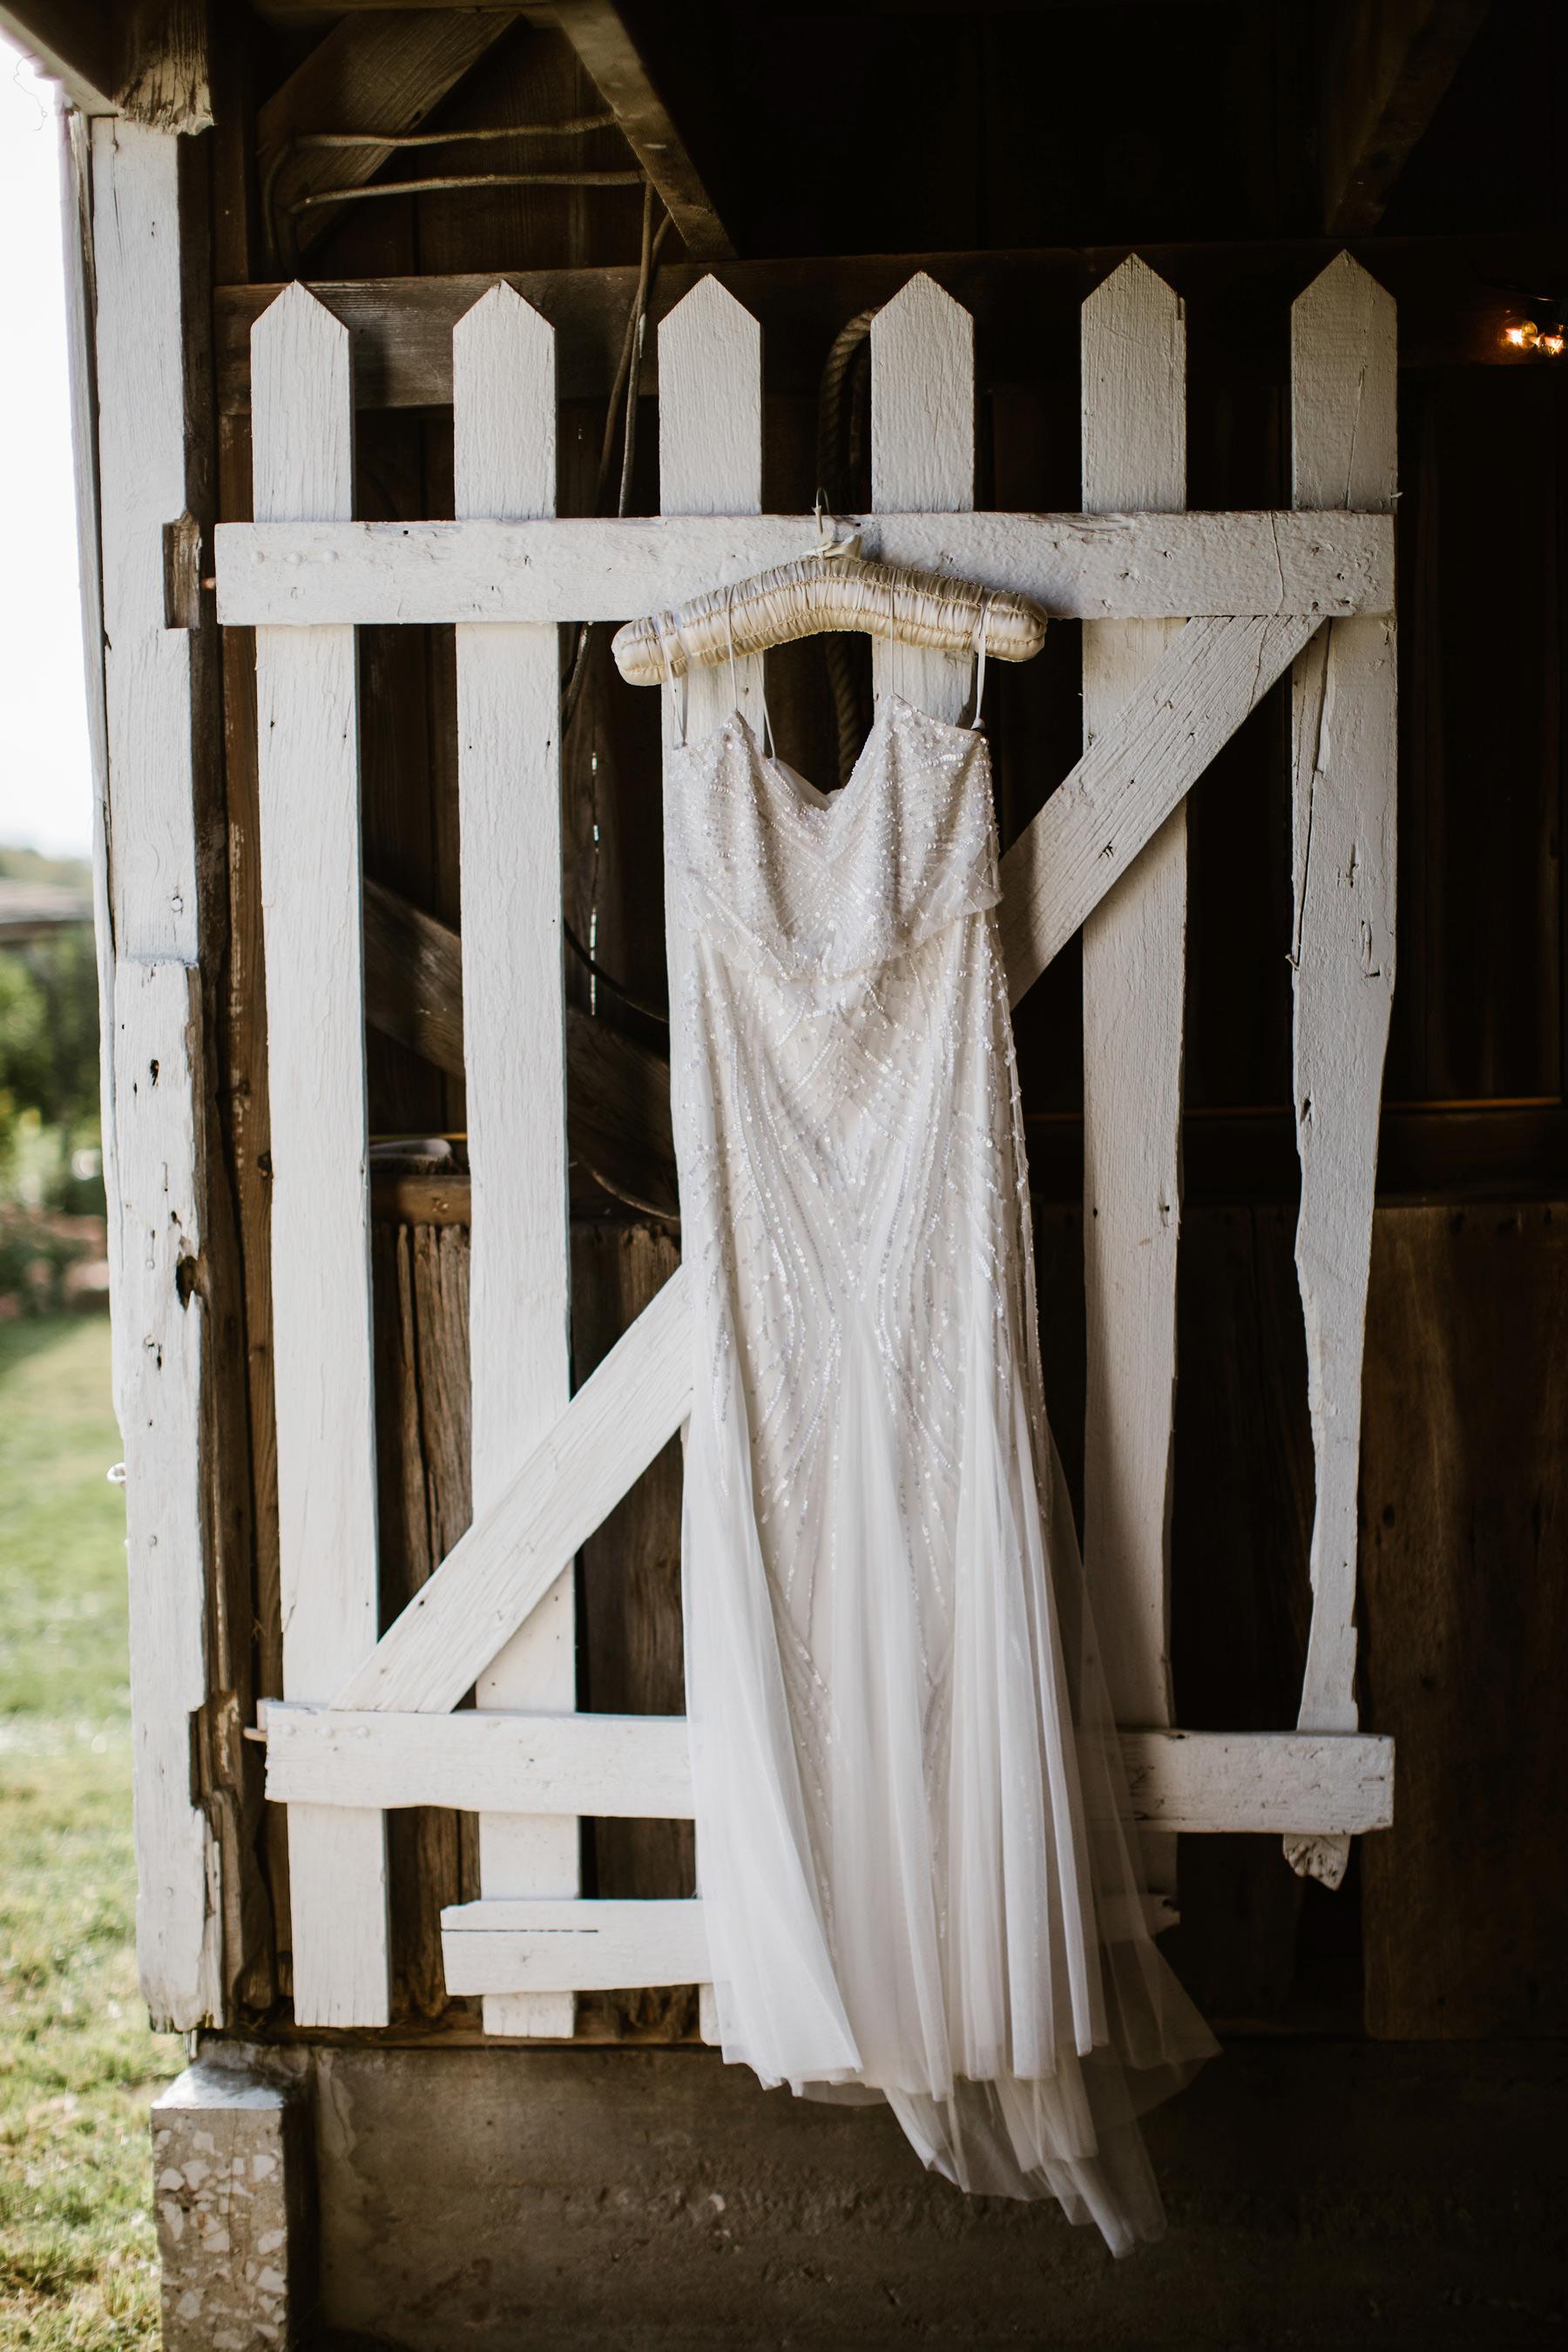 Alldredge Orchard Kansas City_Kindling Wedding Photography BLOG 20.JPG